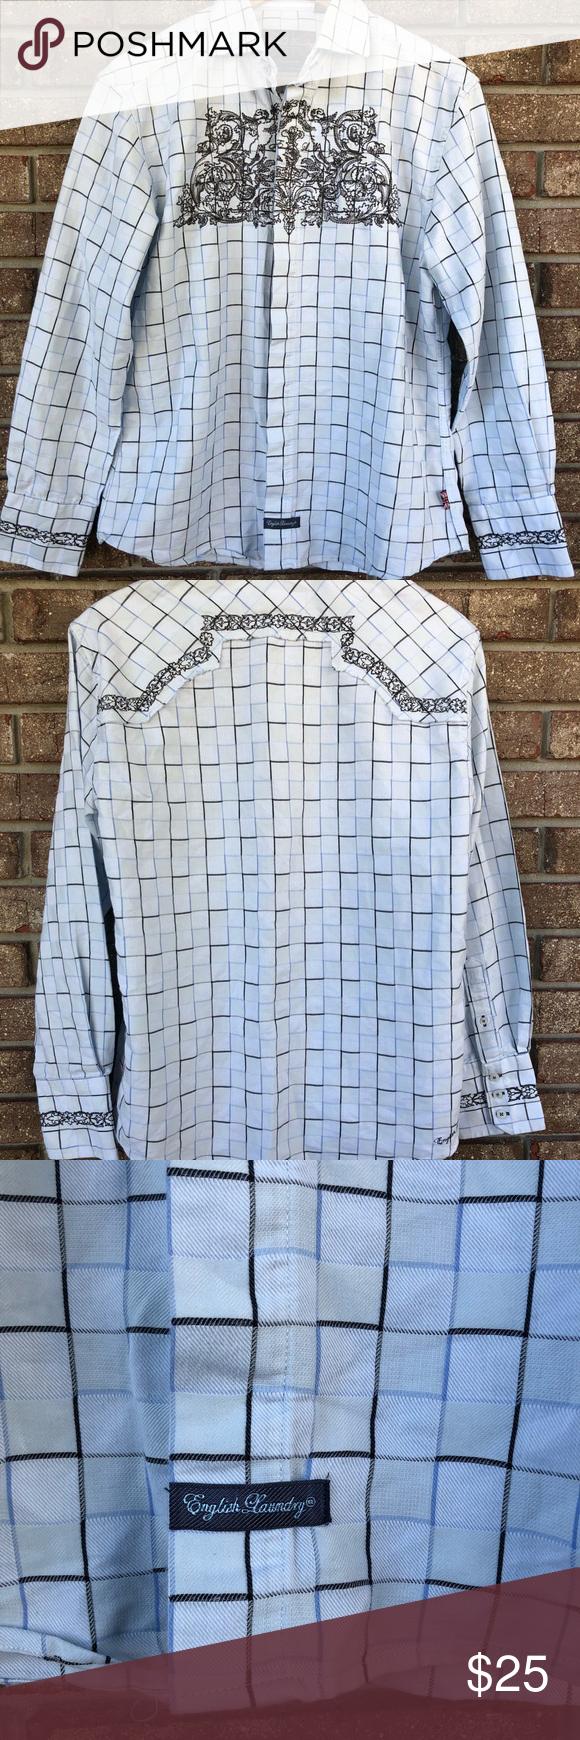 f81add61c4 English Laundry Christopher Wicks Dress Shirt S English Laundry Christopher  Wicks Dress Shirt Plaid with Black